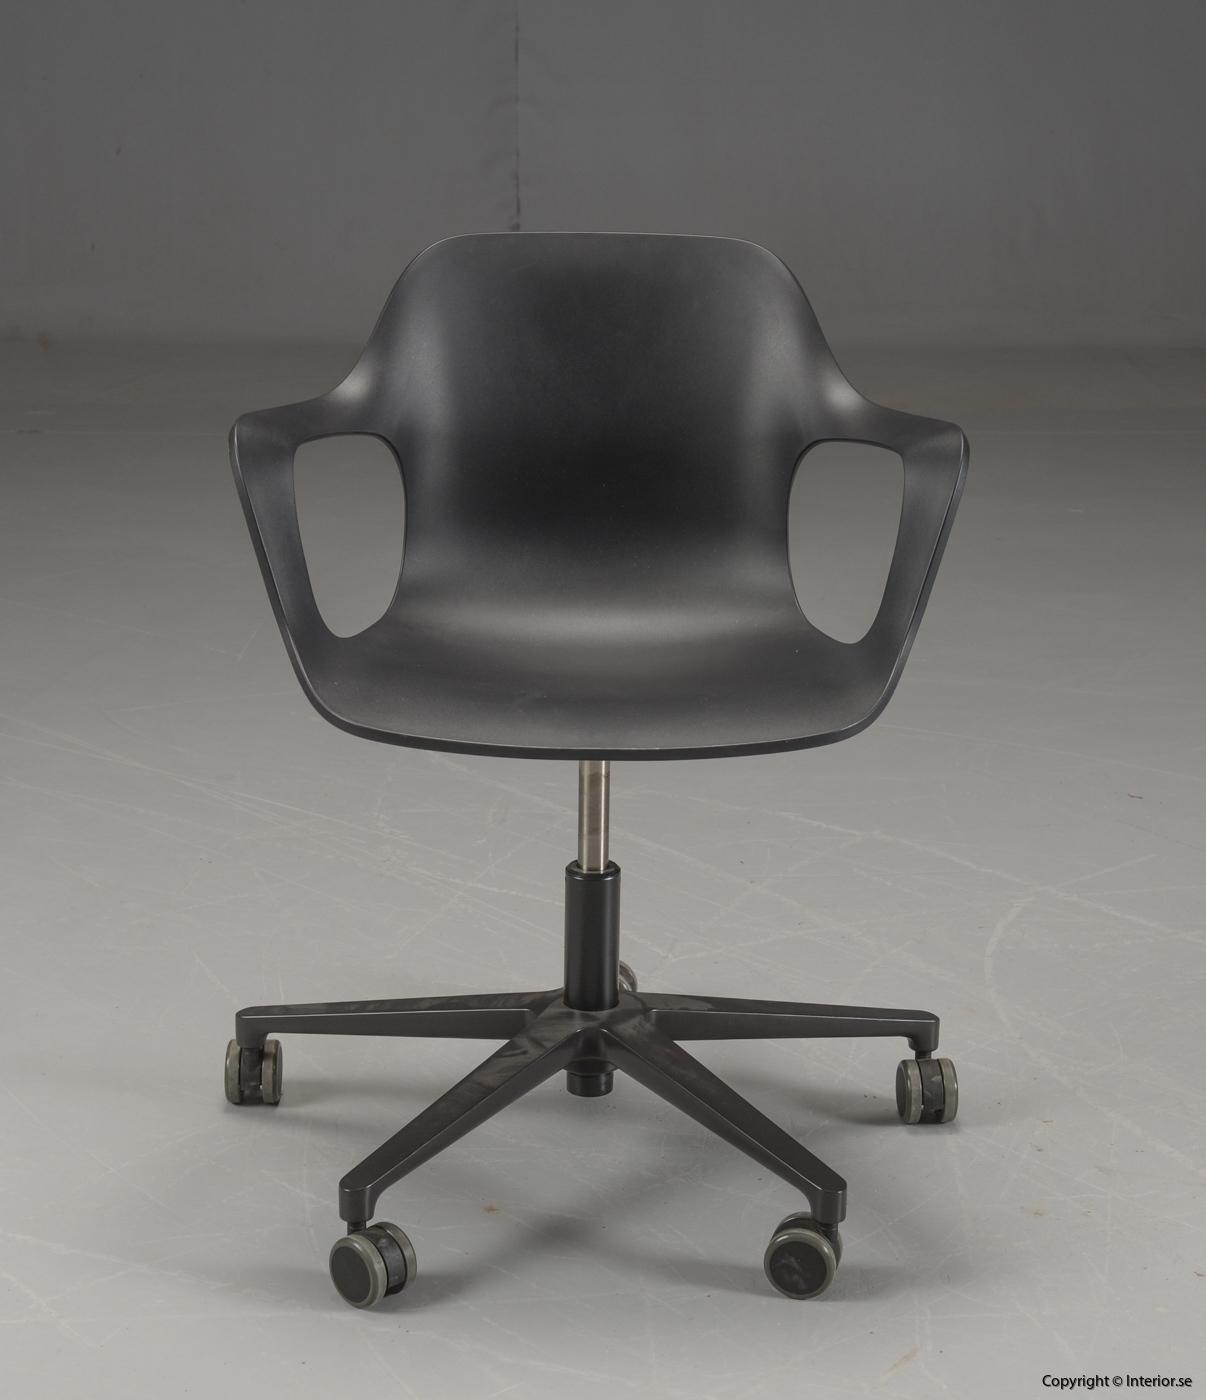 Kontorsstol Bureaustoel Bürostuhl Vitra HAL Armchair Studio - Jasper Morrison 2